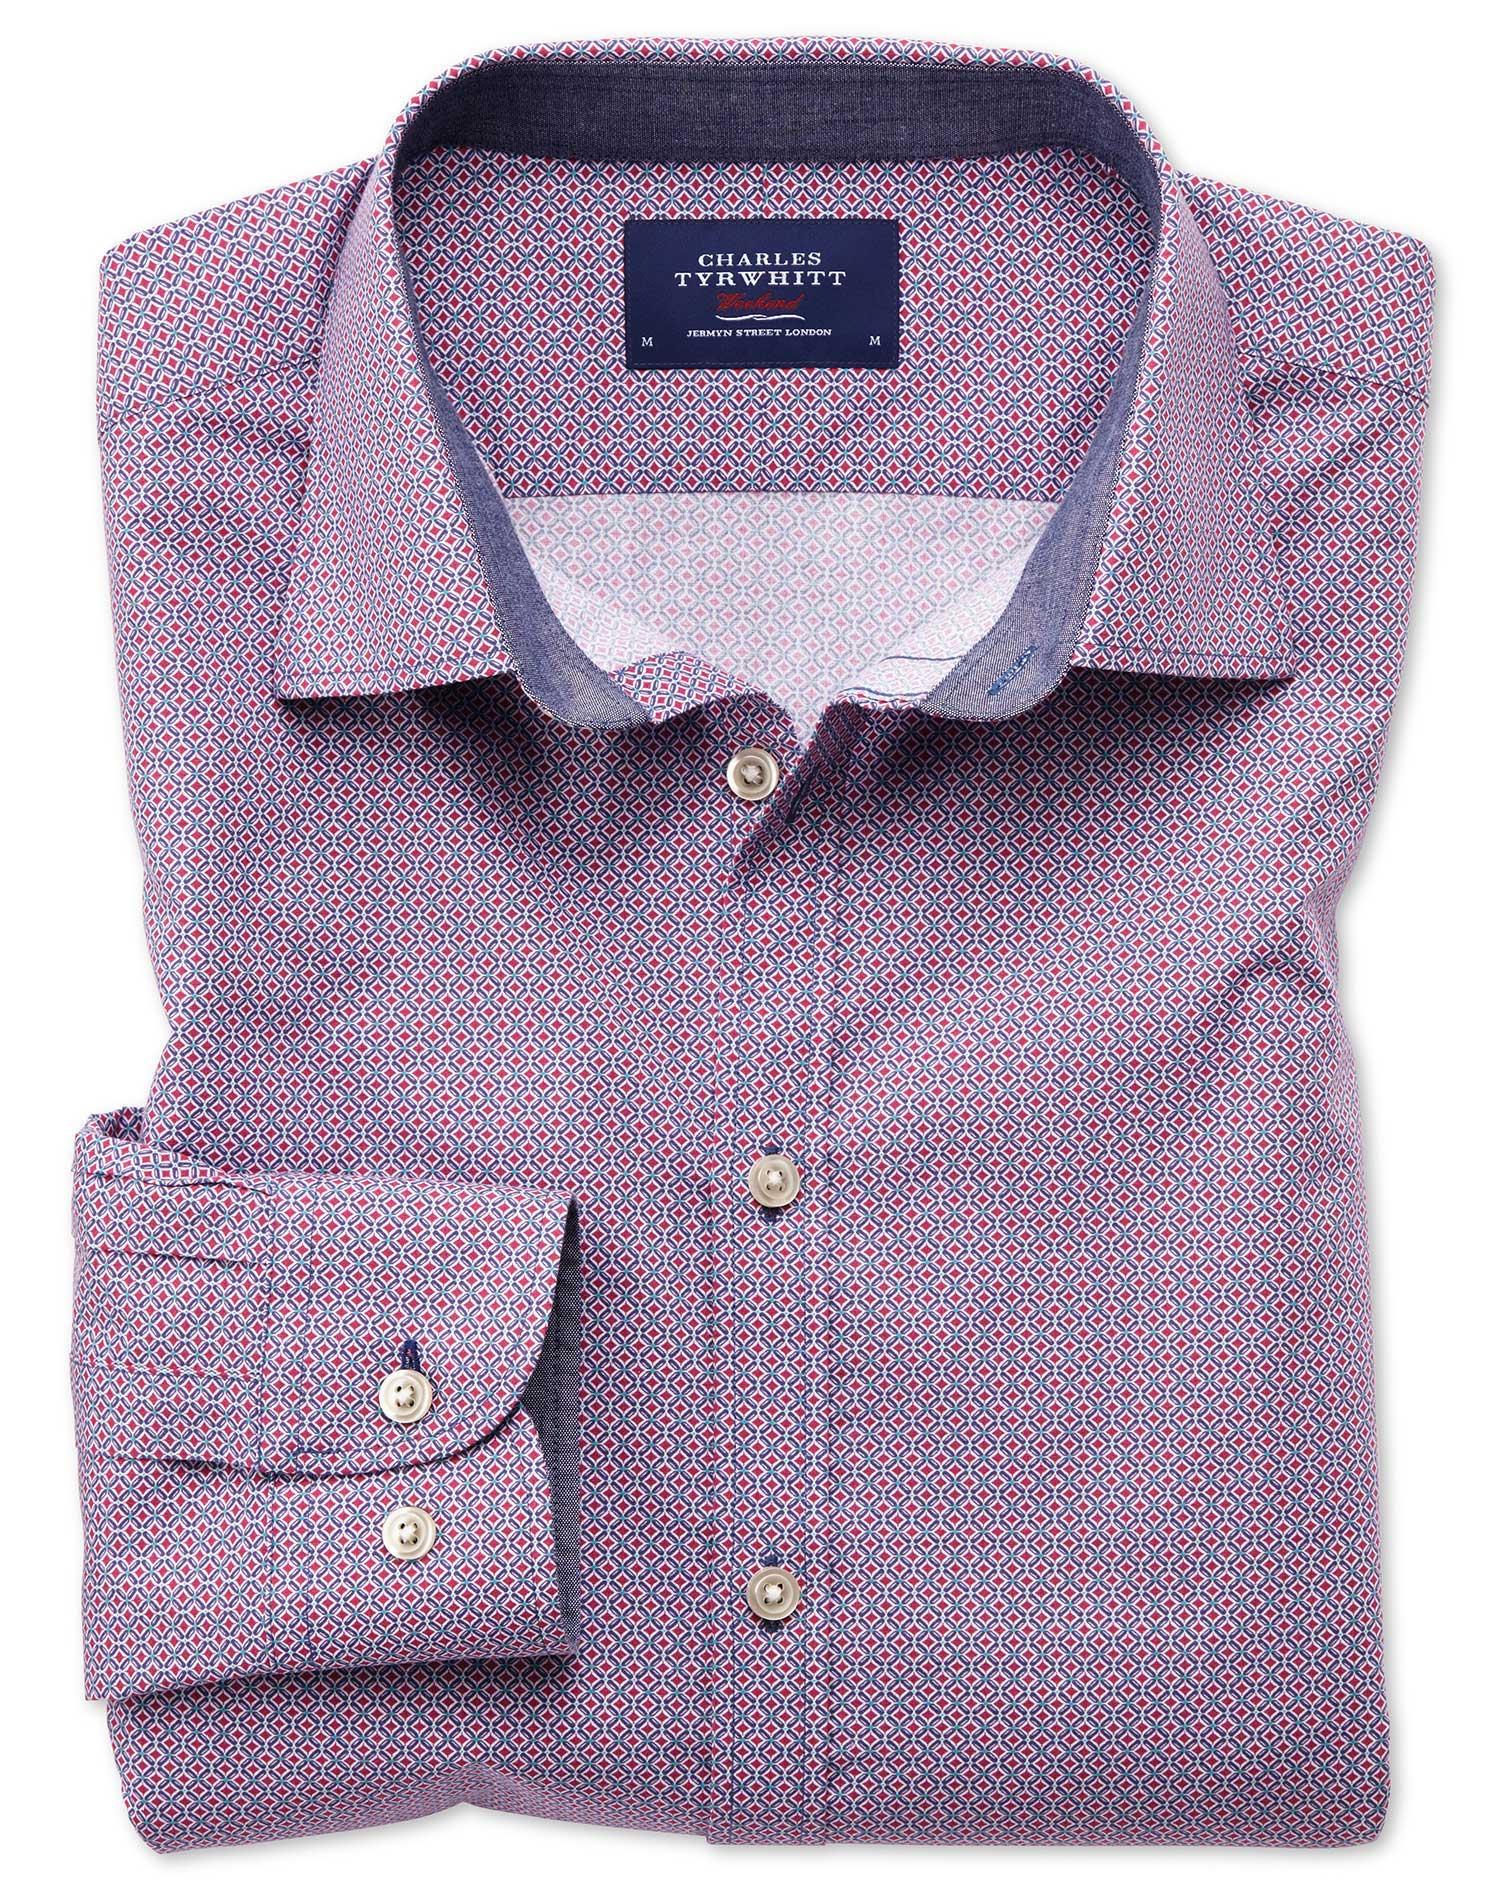 Extra Slim Fit Magenta And Blue Print Shirt Charles Tyrwhitt